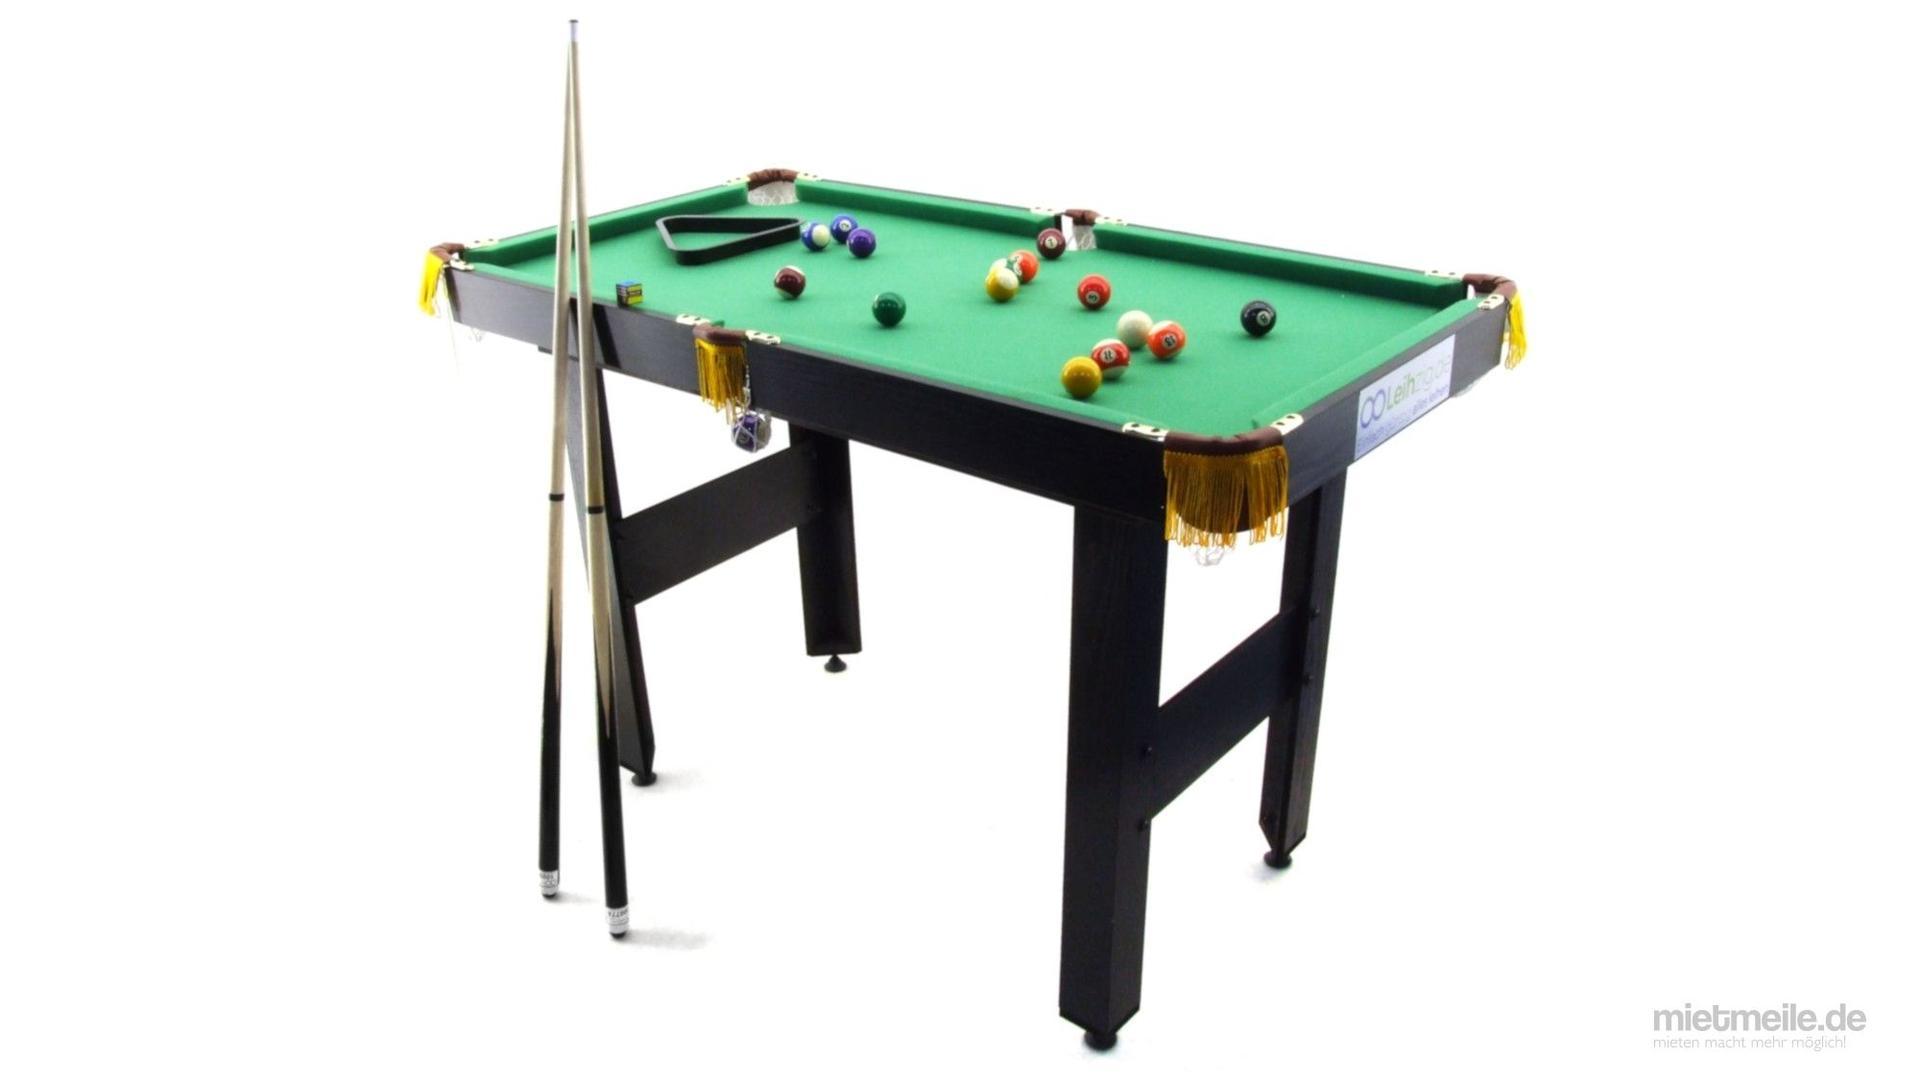 Billardtisch mieten & vermieten - Billard-Tisch Pool in Schkeuditz